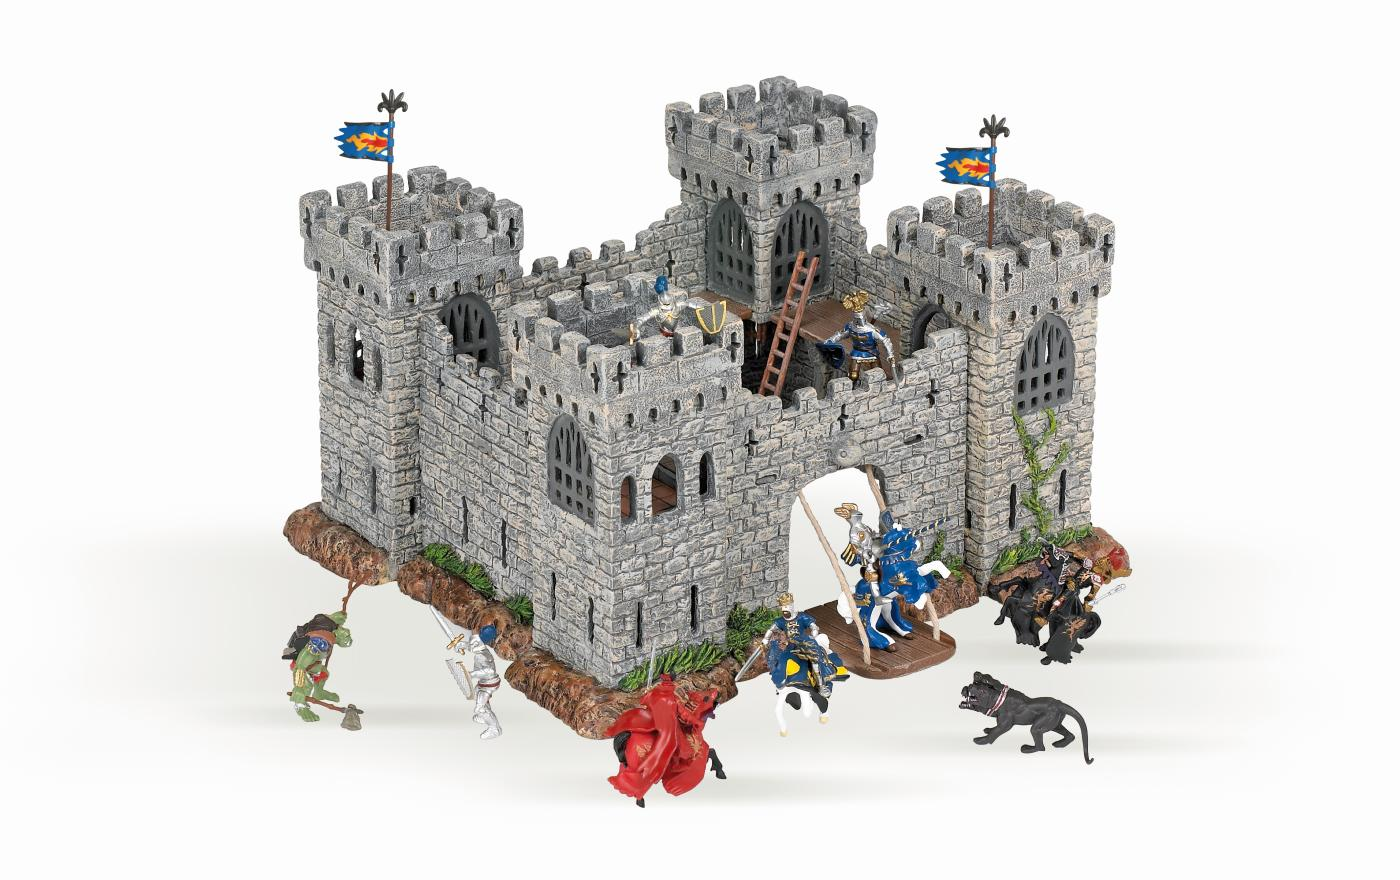 papo 33102 mini plastic castle tv902 minis at spielzeug. Black Bedroom Furniture Sets. Home Design Ideas